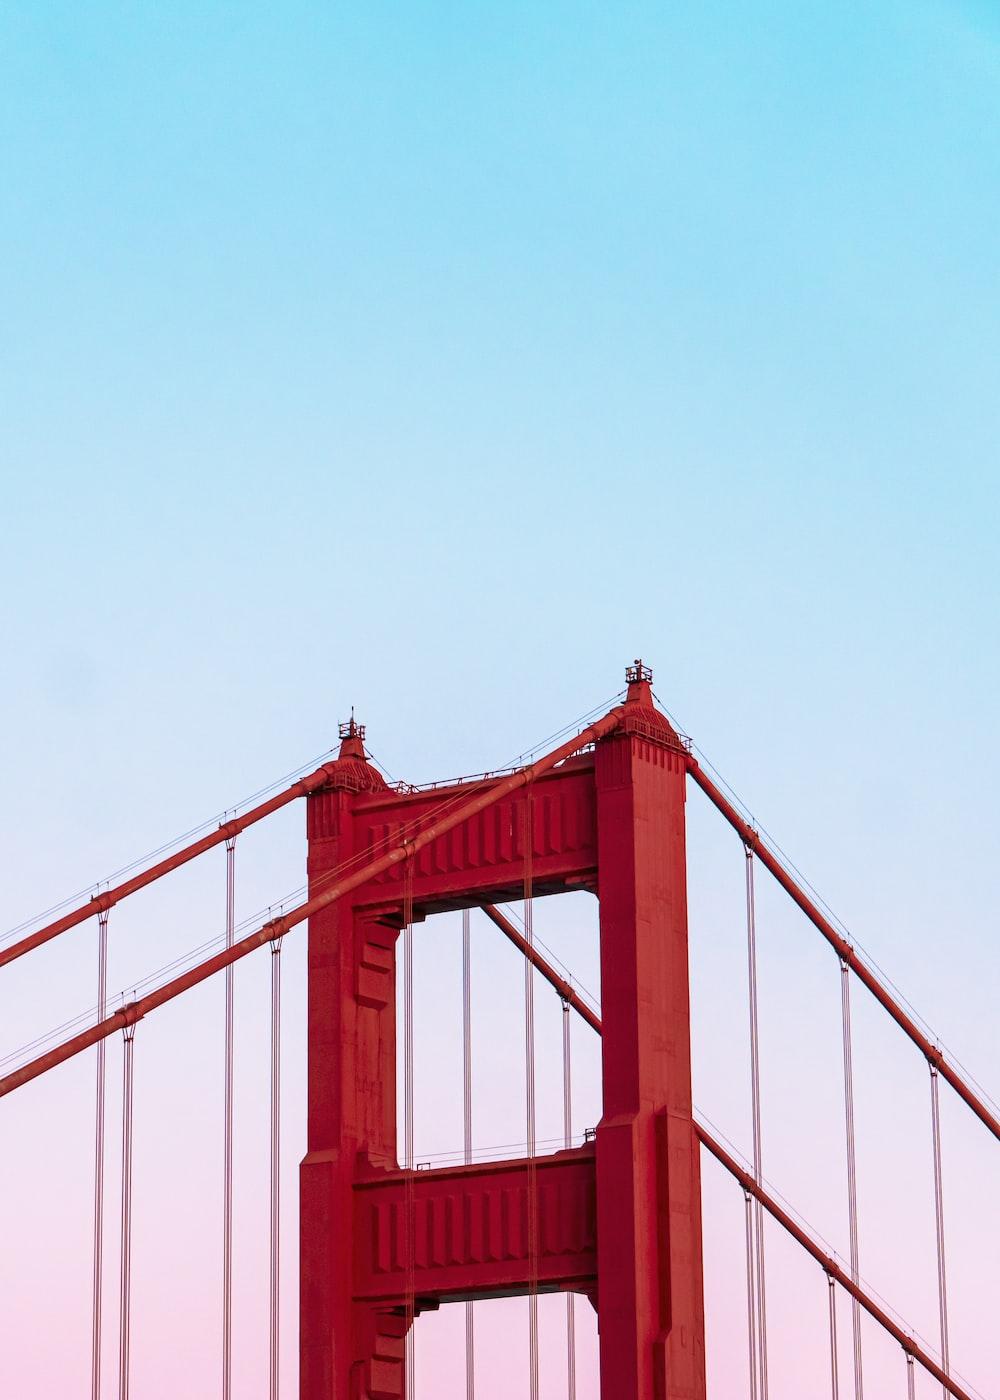 Golden Gate Bridge under a calm blue sky